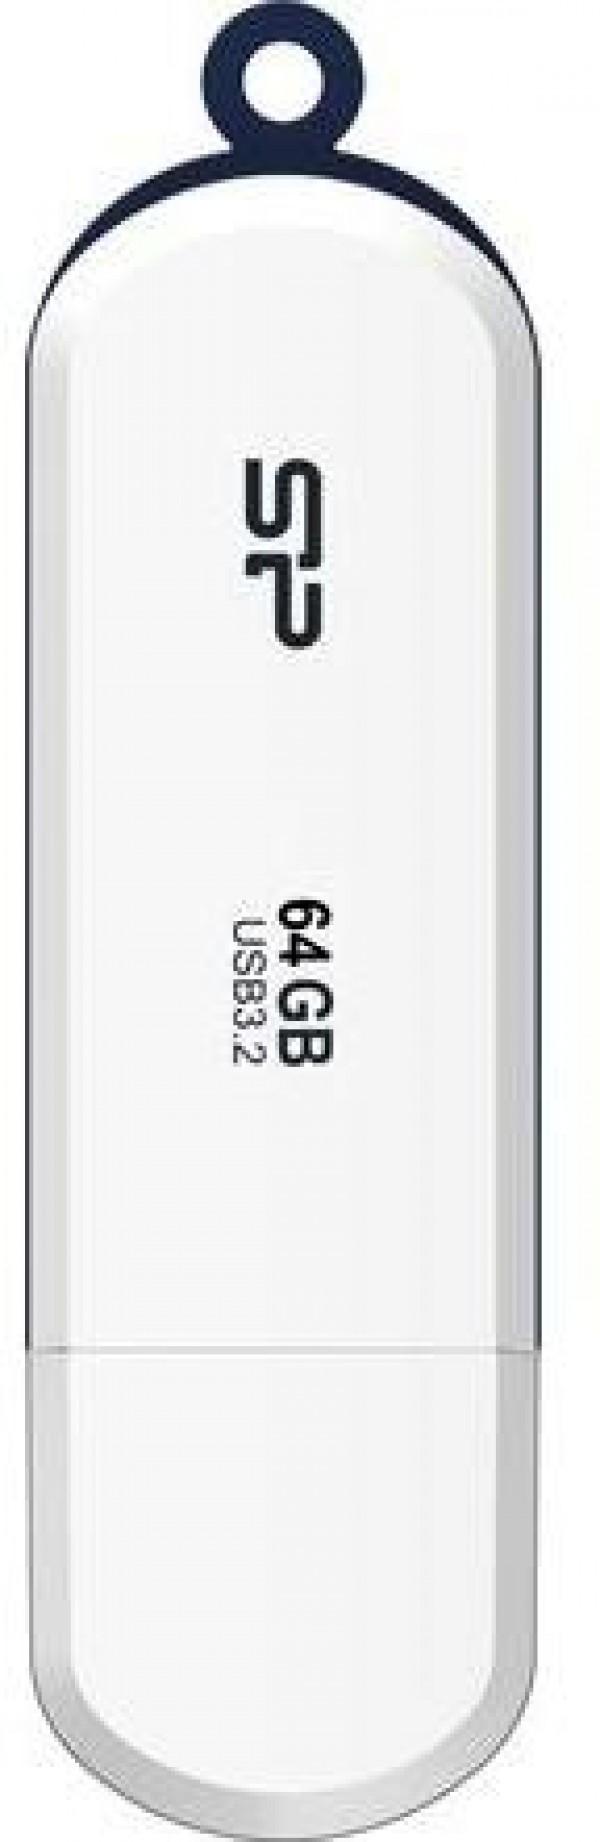 Flash Drive Silicon Power 64GB Blaze B32 USB3.2 SP064GBUF3B32V1W White